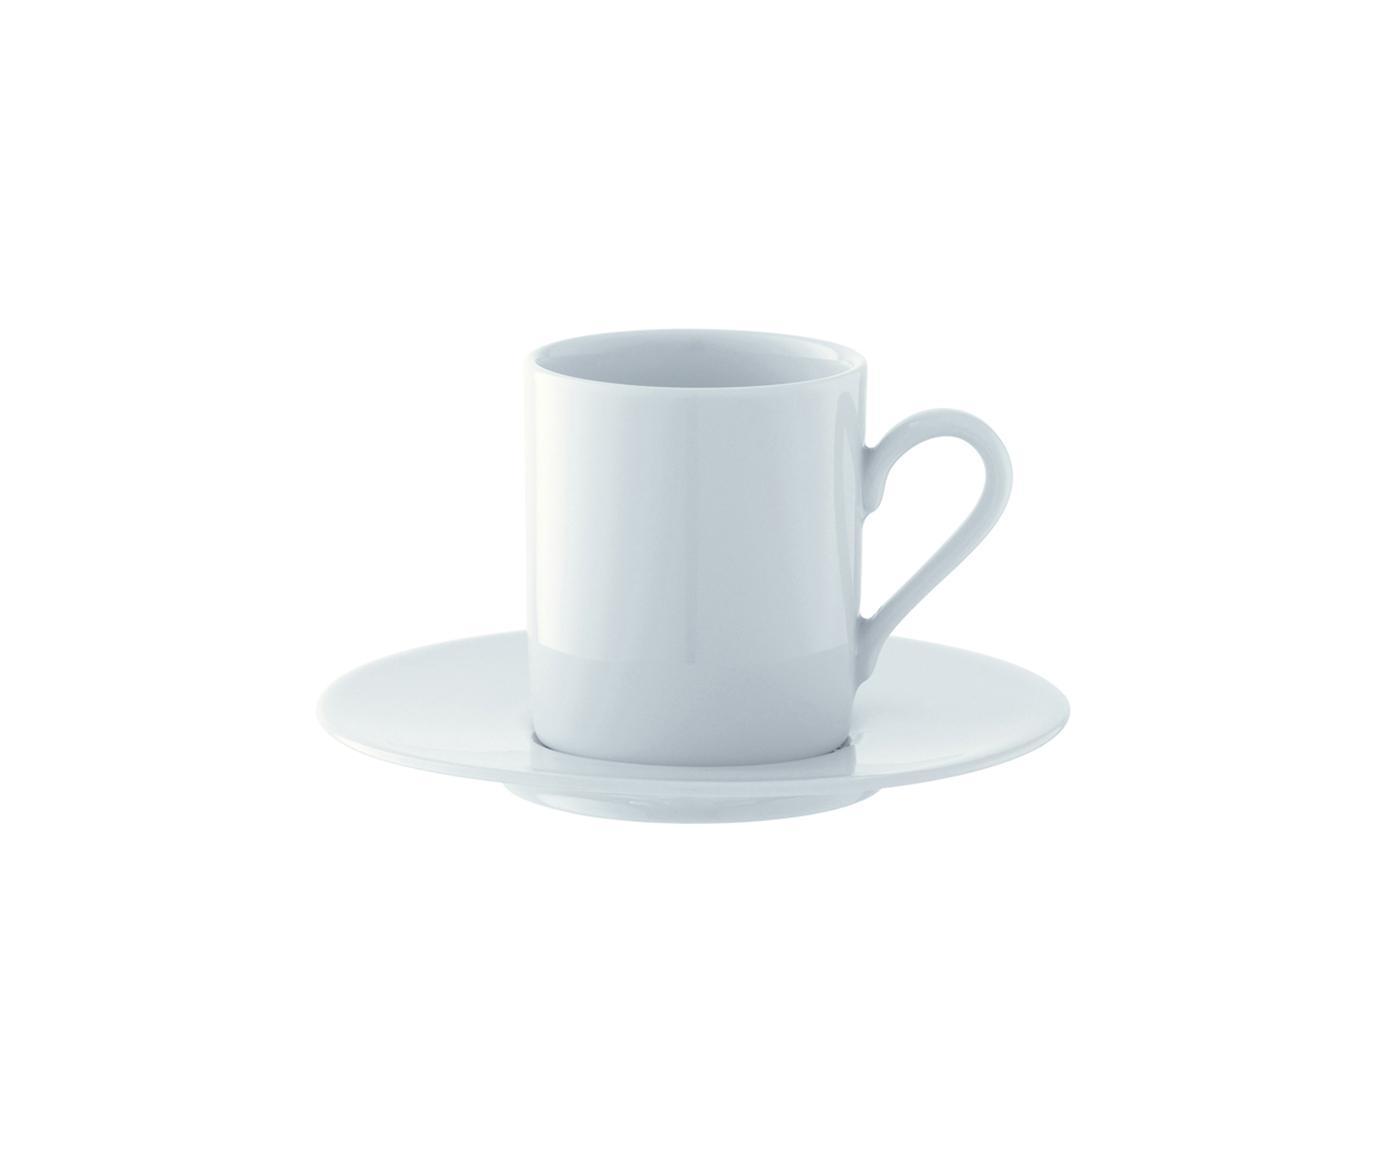 Espressokopjesset Bianco, 8-delig, Porselein, Wit, Ø 12 x H 7 cm